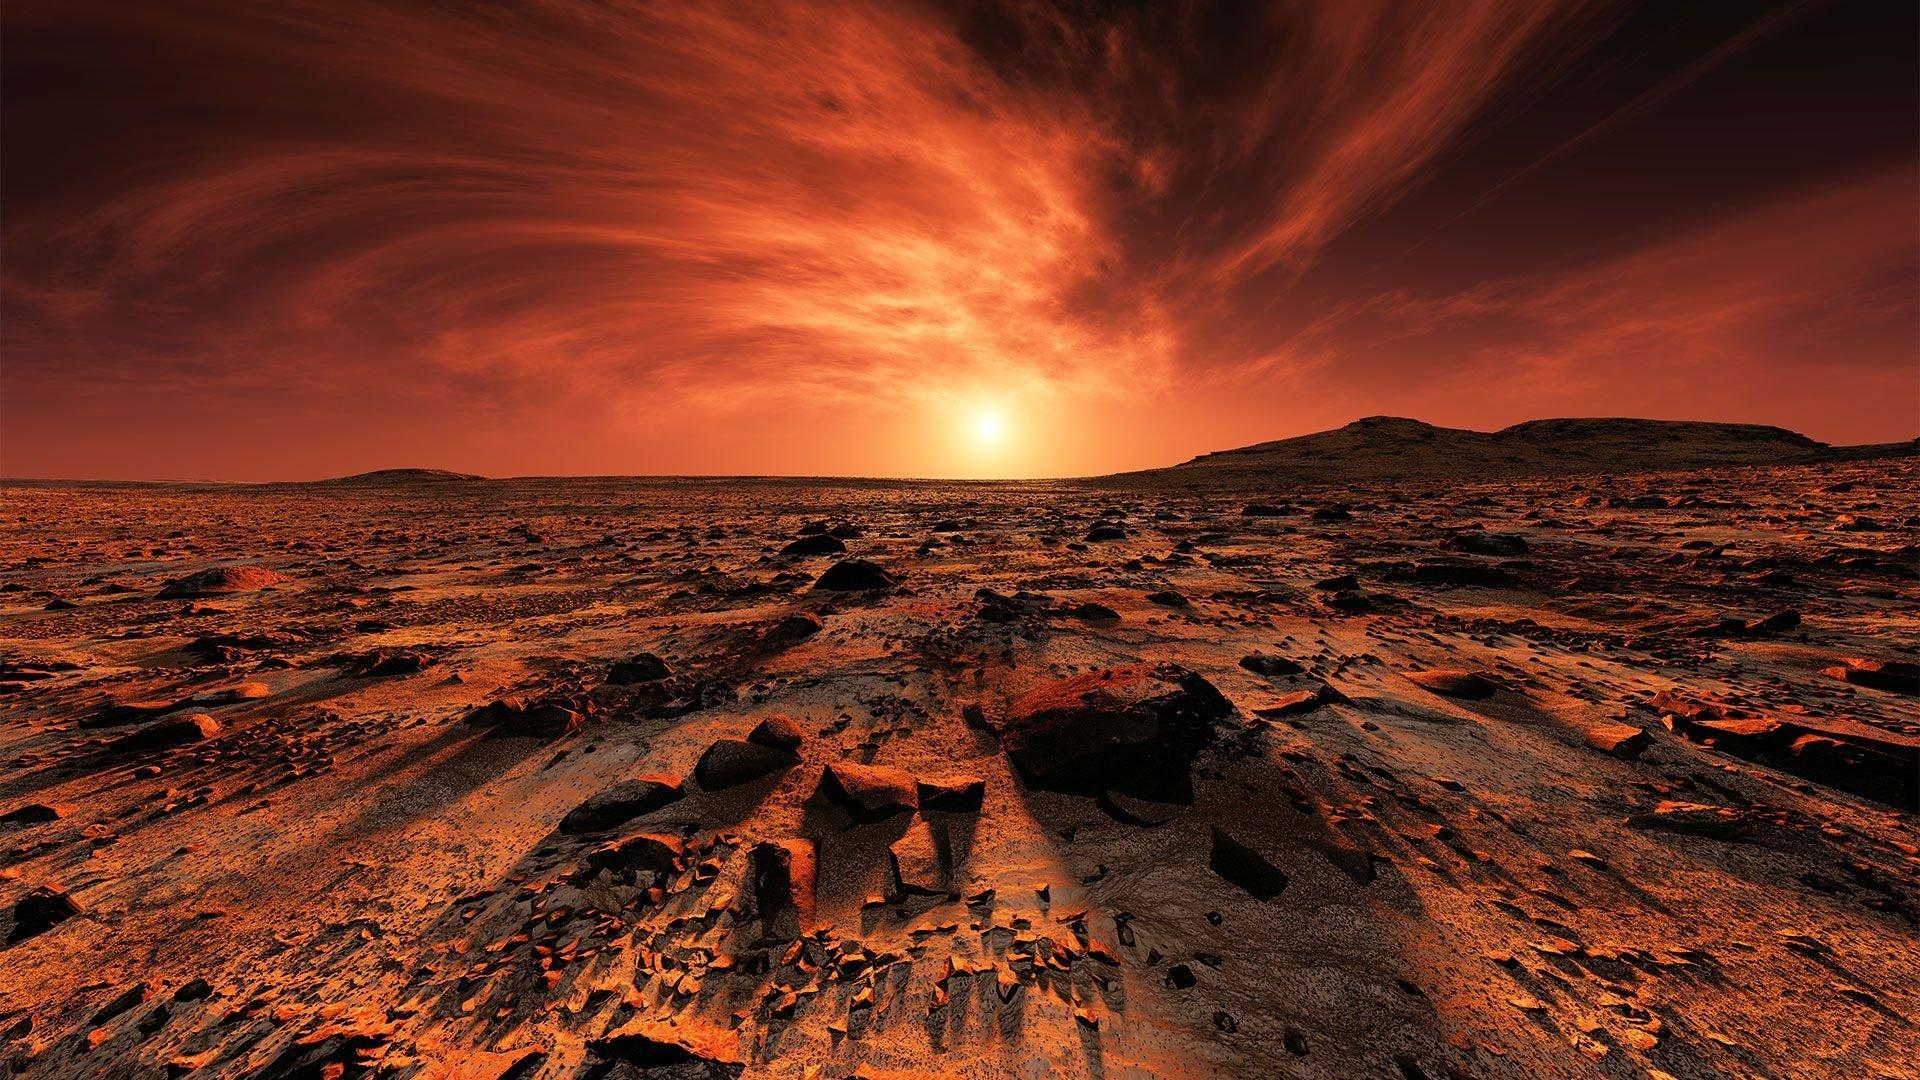 Mars Wallpaper Free Download